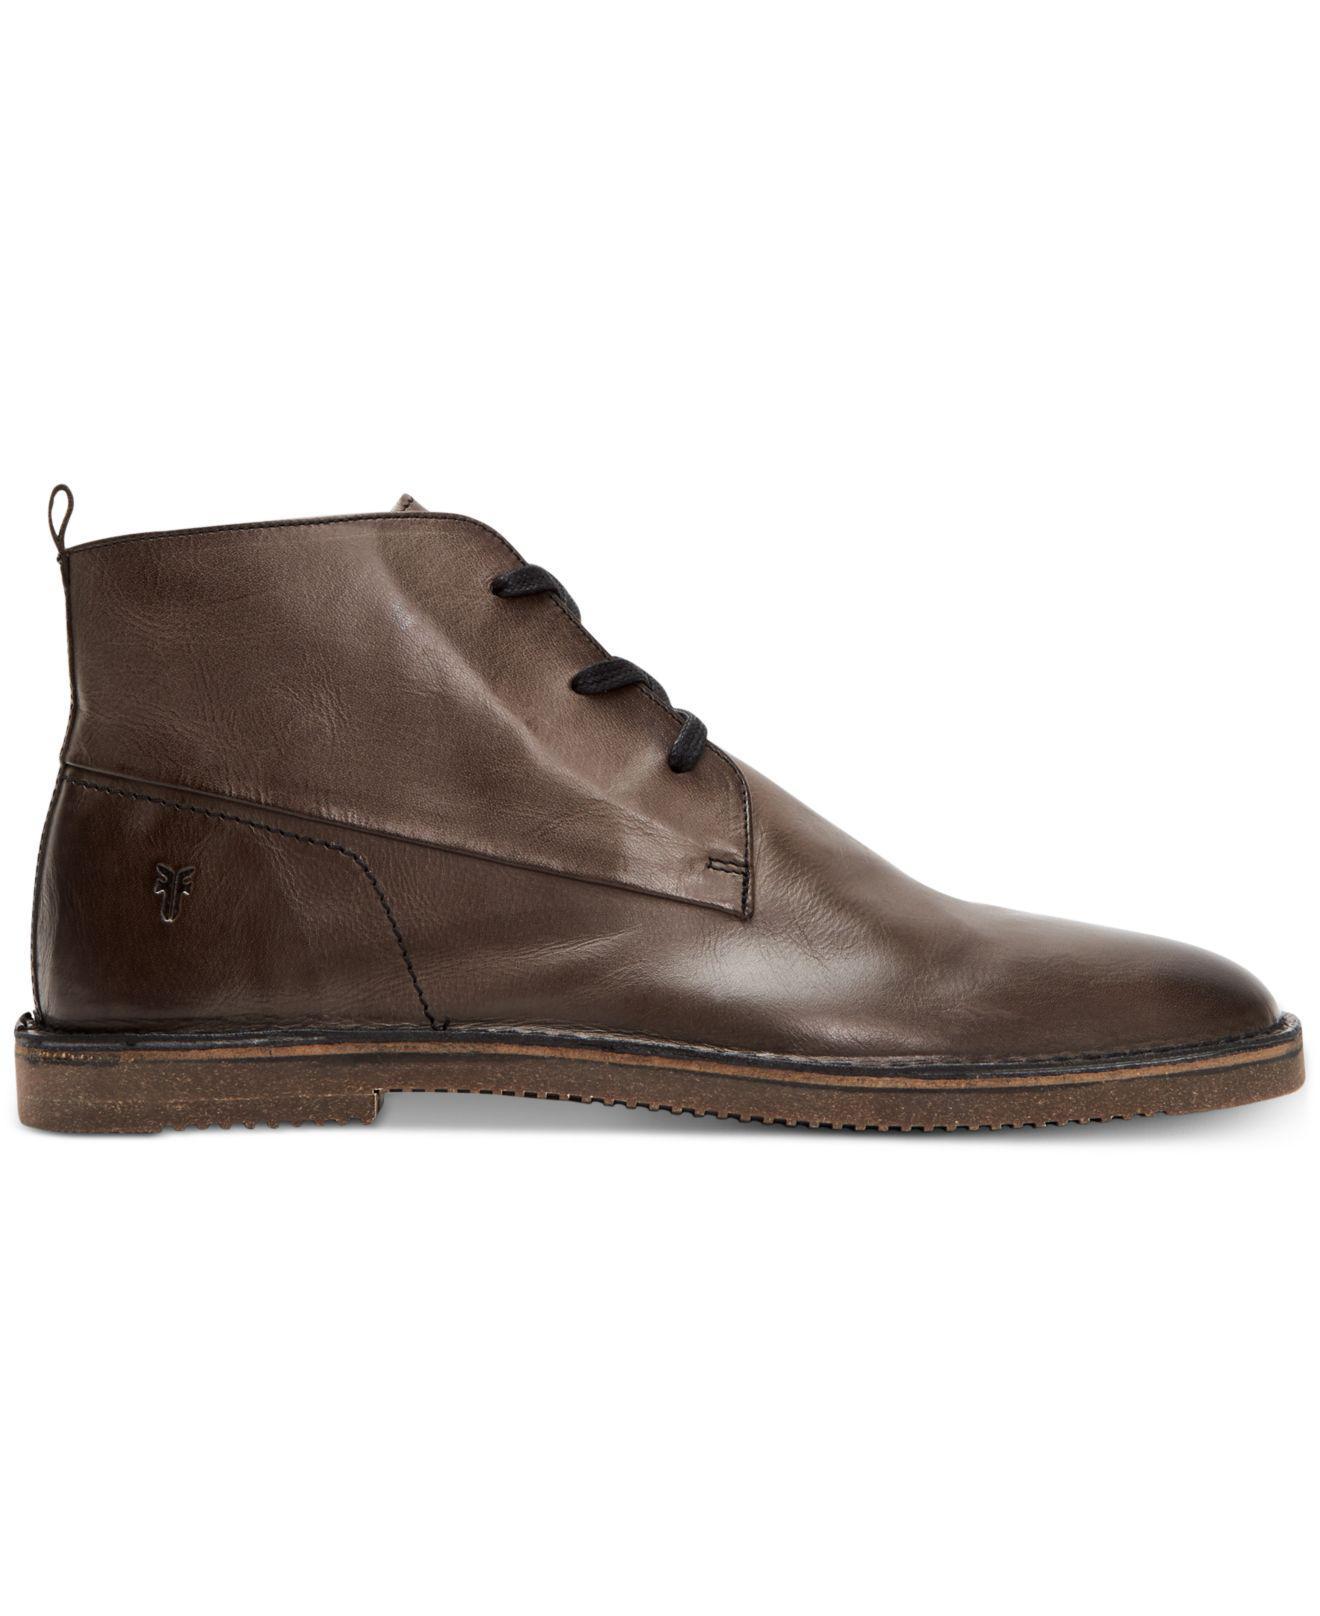 71e8630b865 Lyst - Frye Ashland Leather Chukkas in Brown for Men